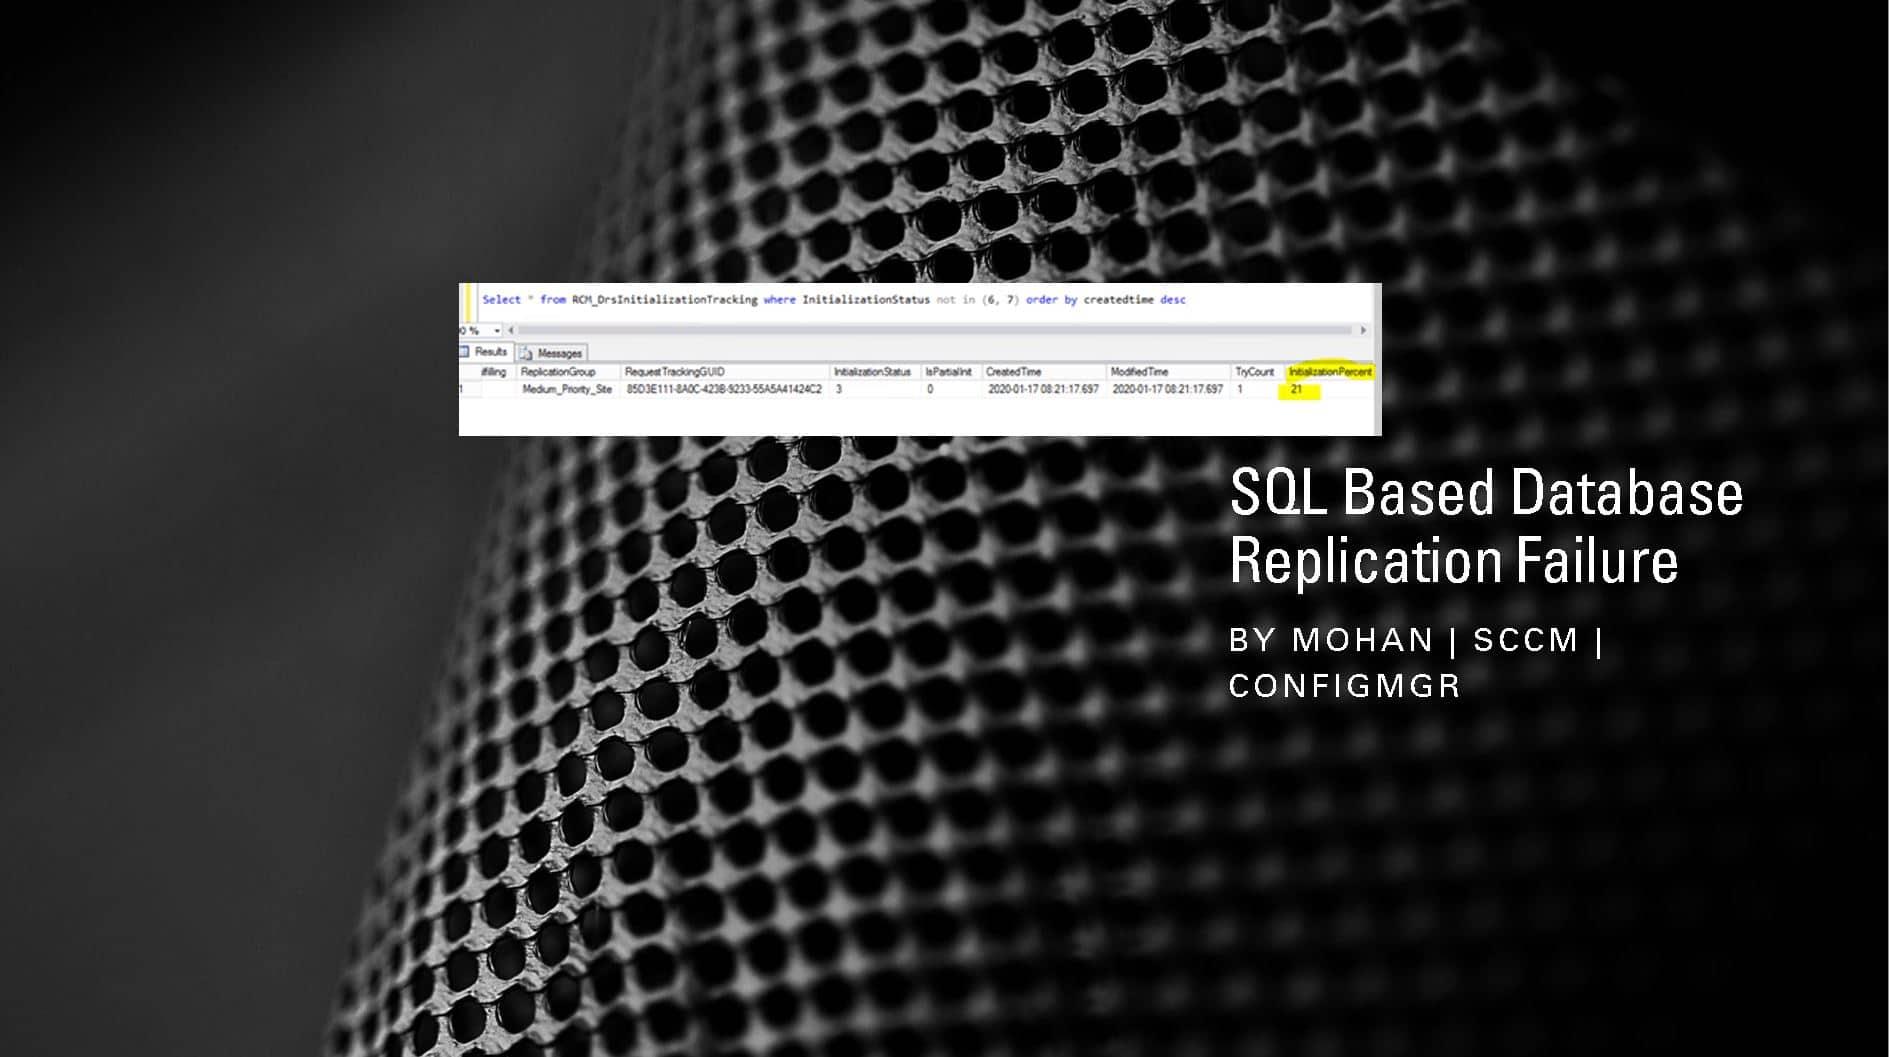 FIX SCCM SQL Based Database Replication Failure